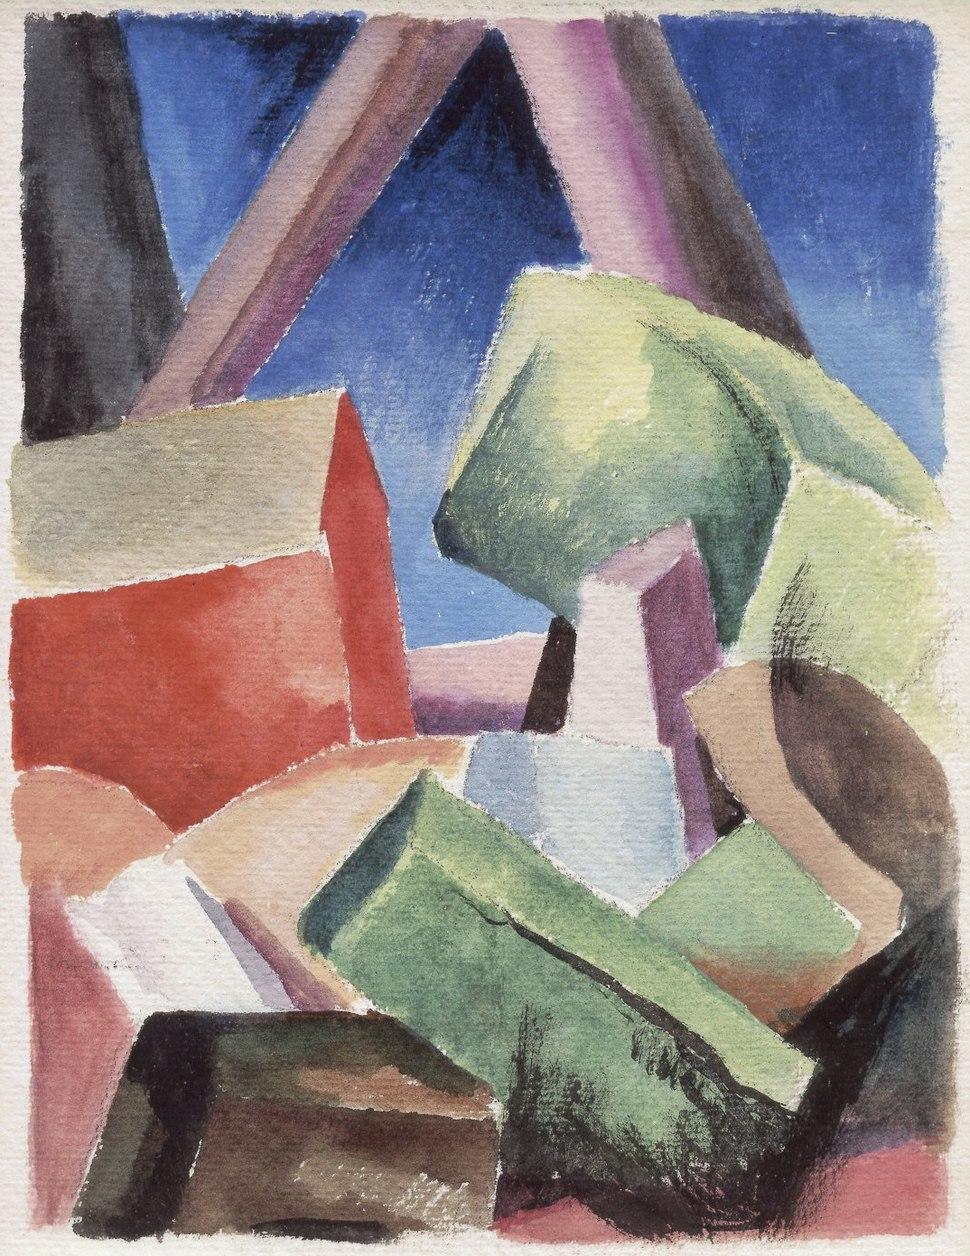 Thomas Hart Benton - House in Cubist Landscape